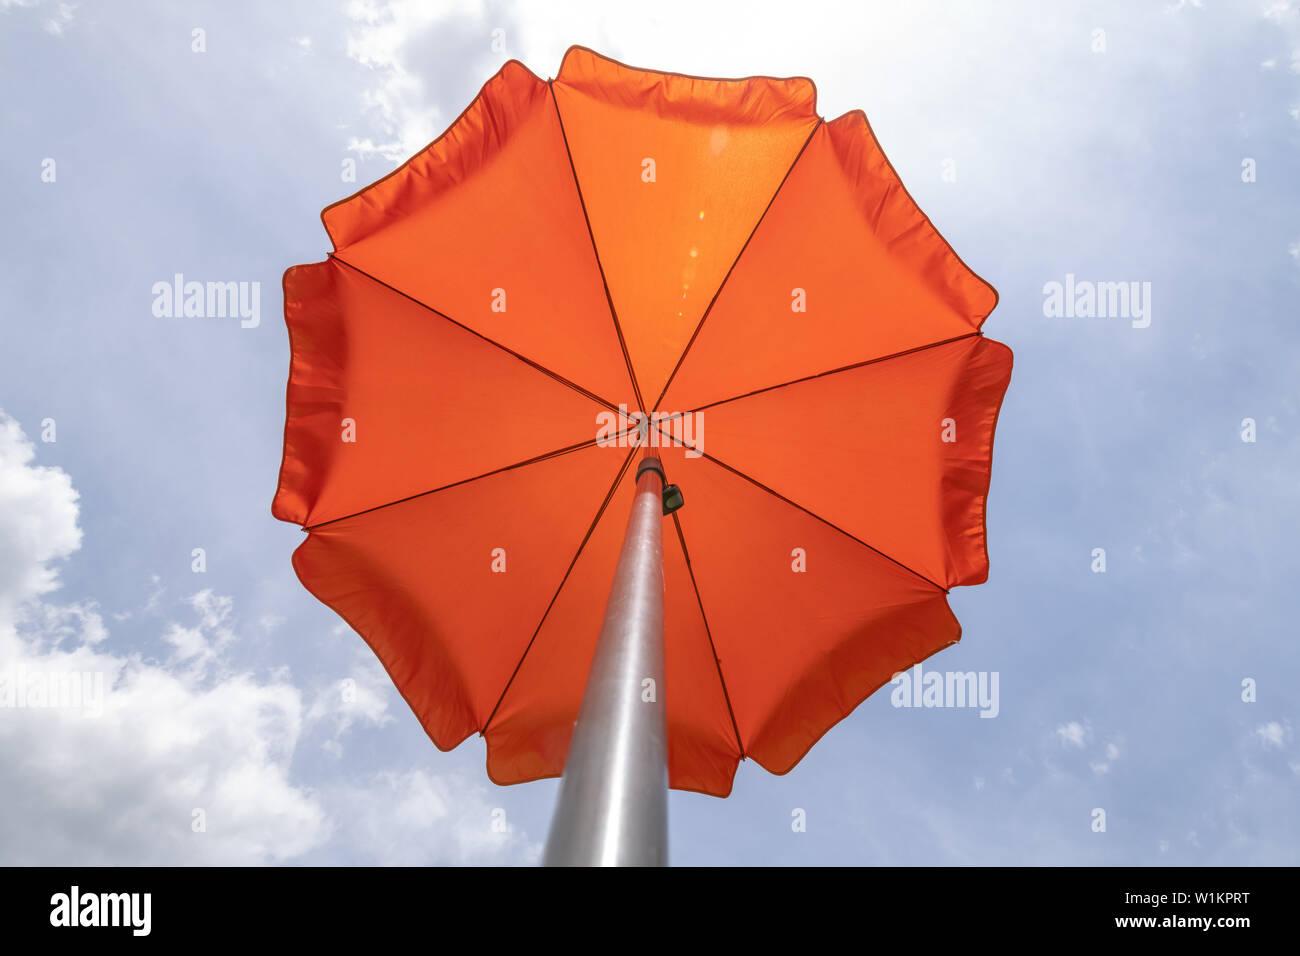 b27af3462 Photo of a beach umbrella on the blue sky,Beach umbrella.One vibrant orange  colored sunshade against vivid blue sky and white cloud.